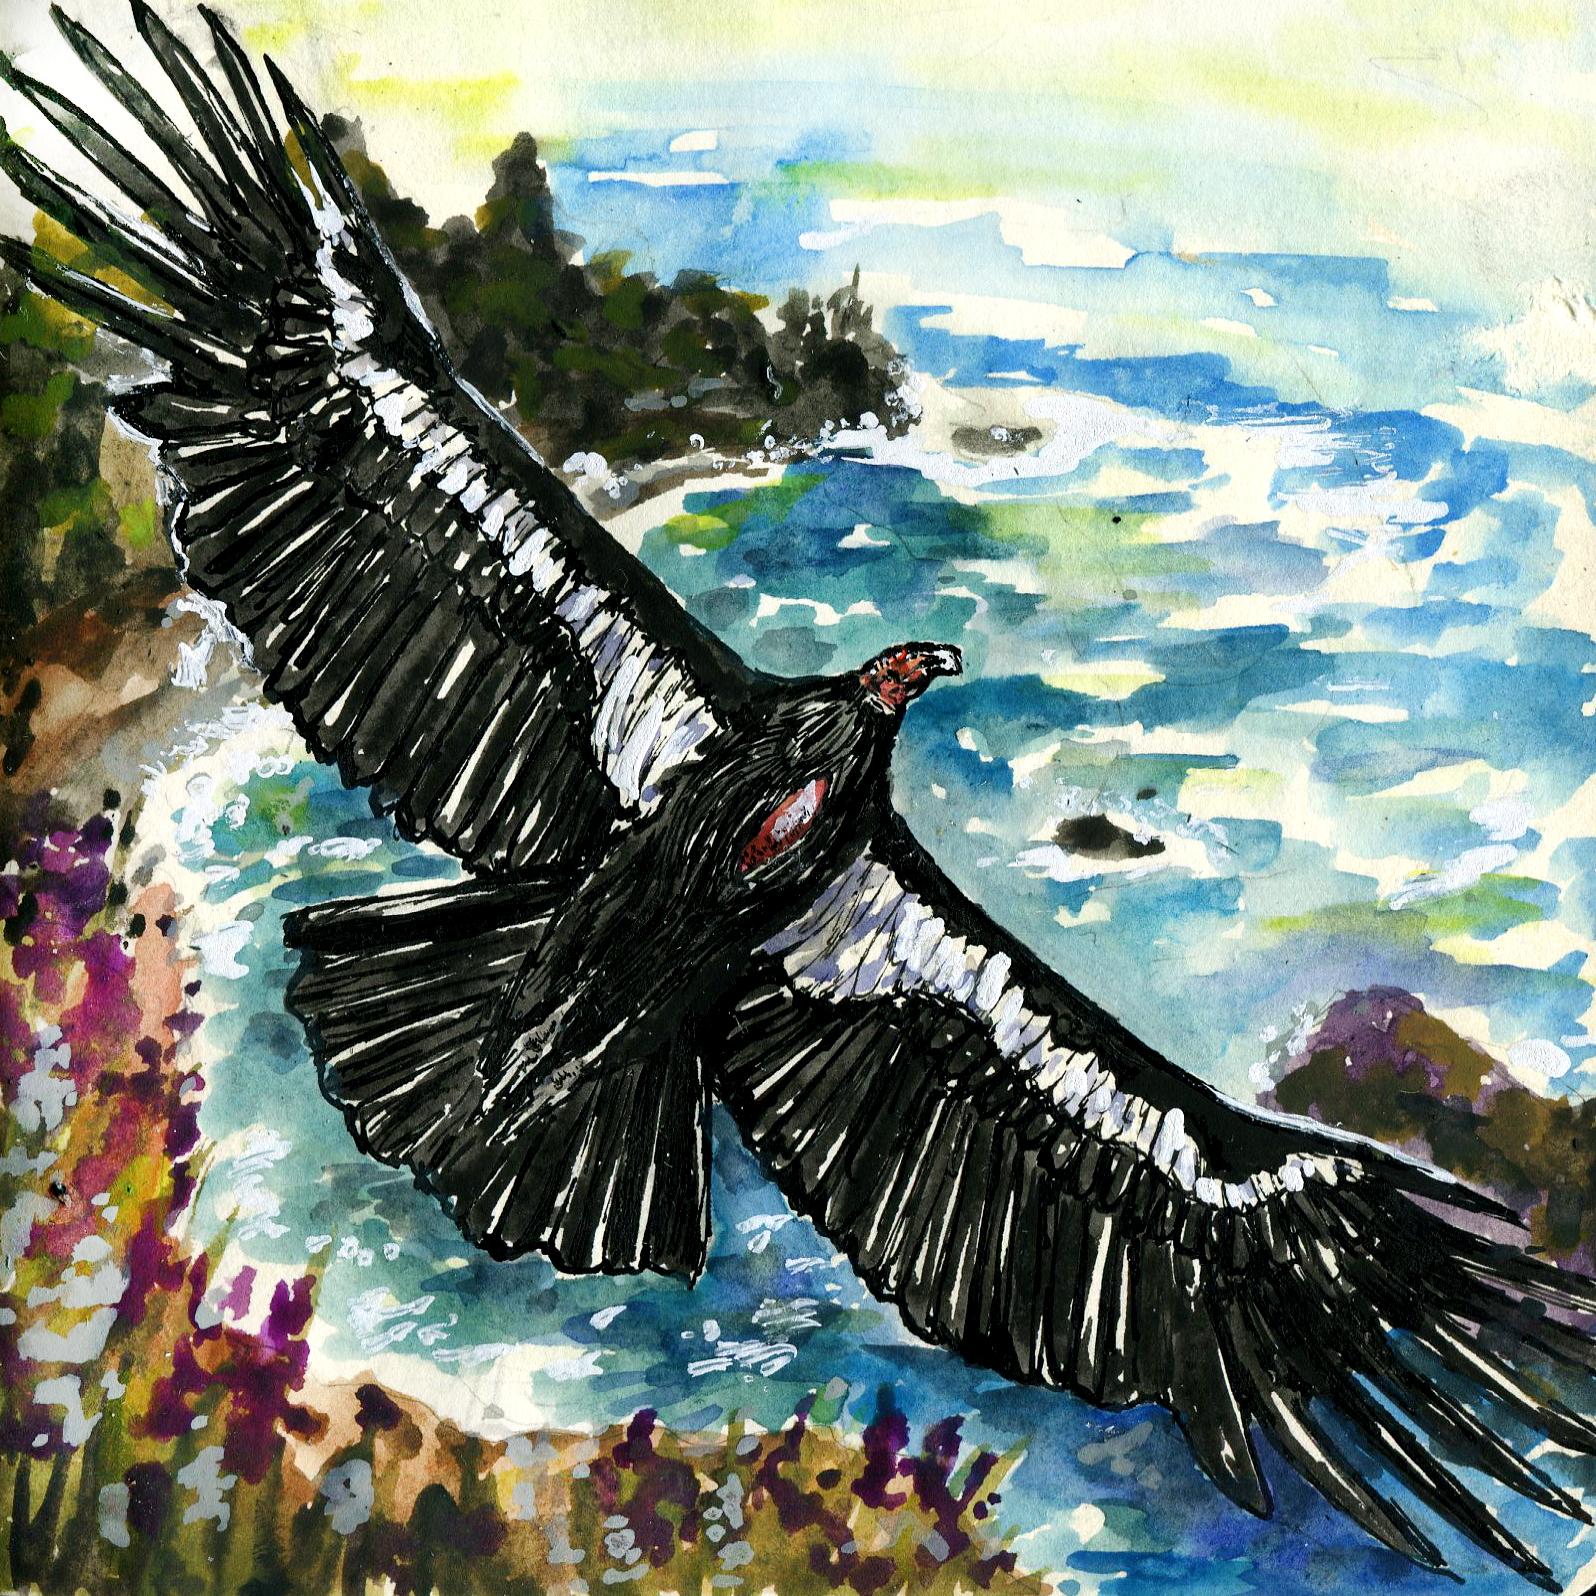 377. California Condor